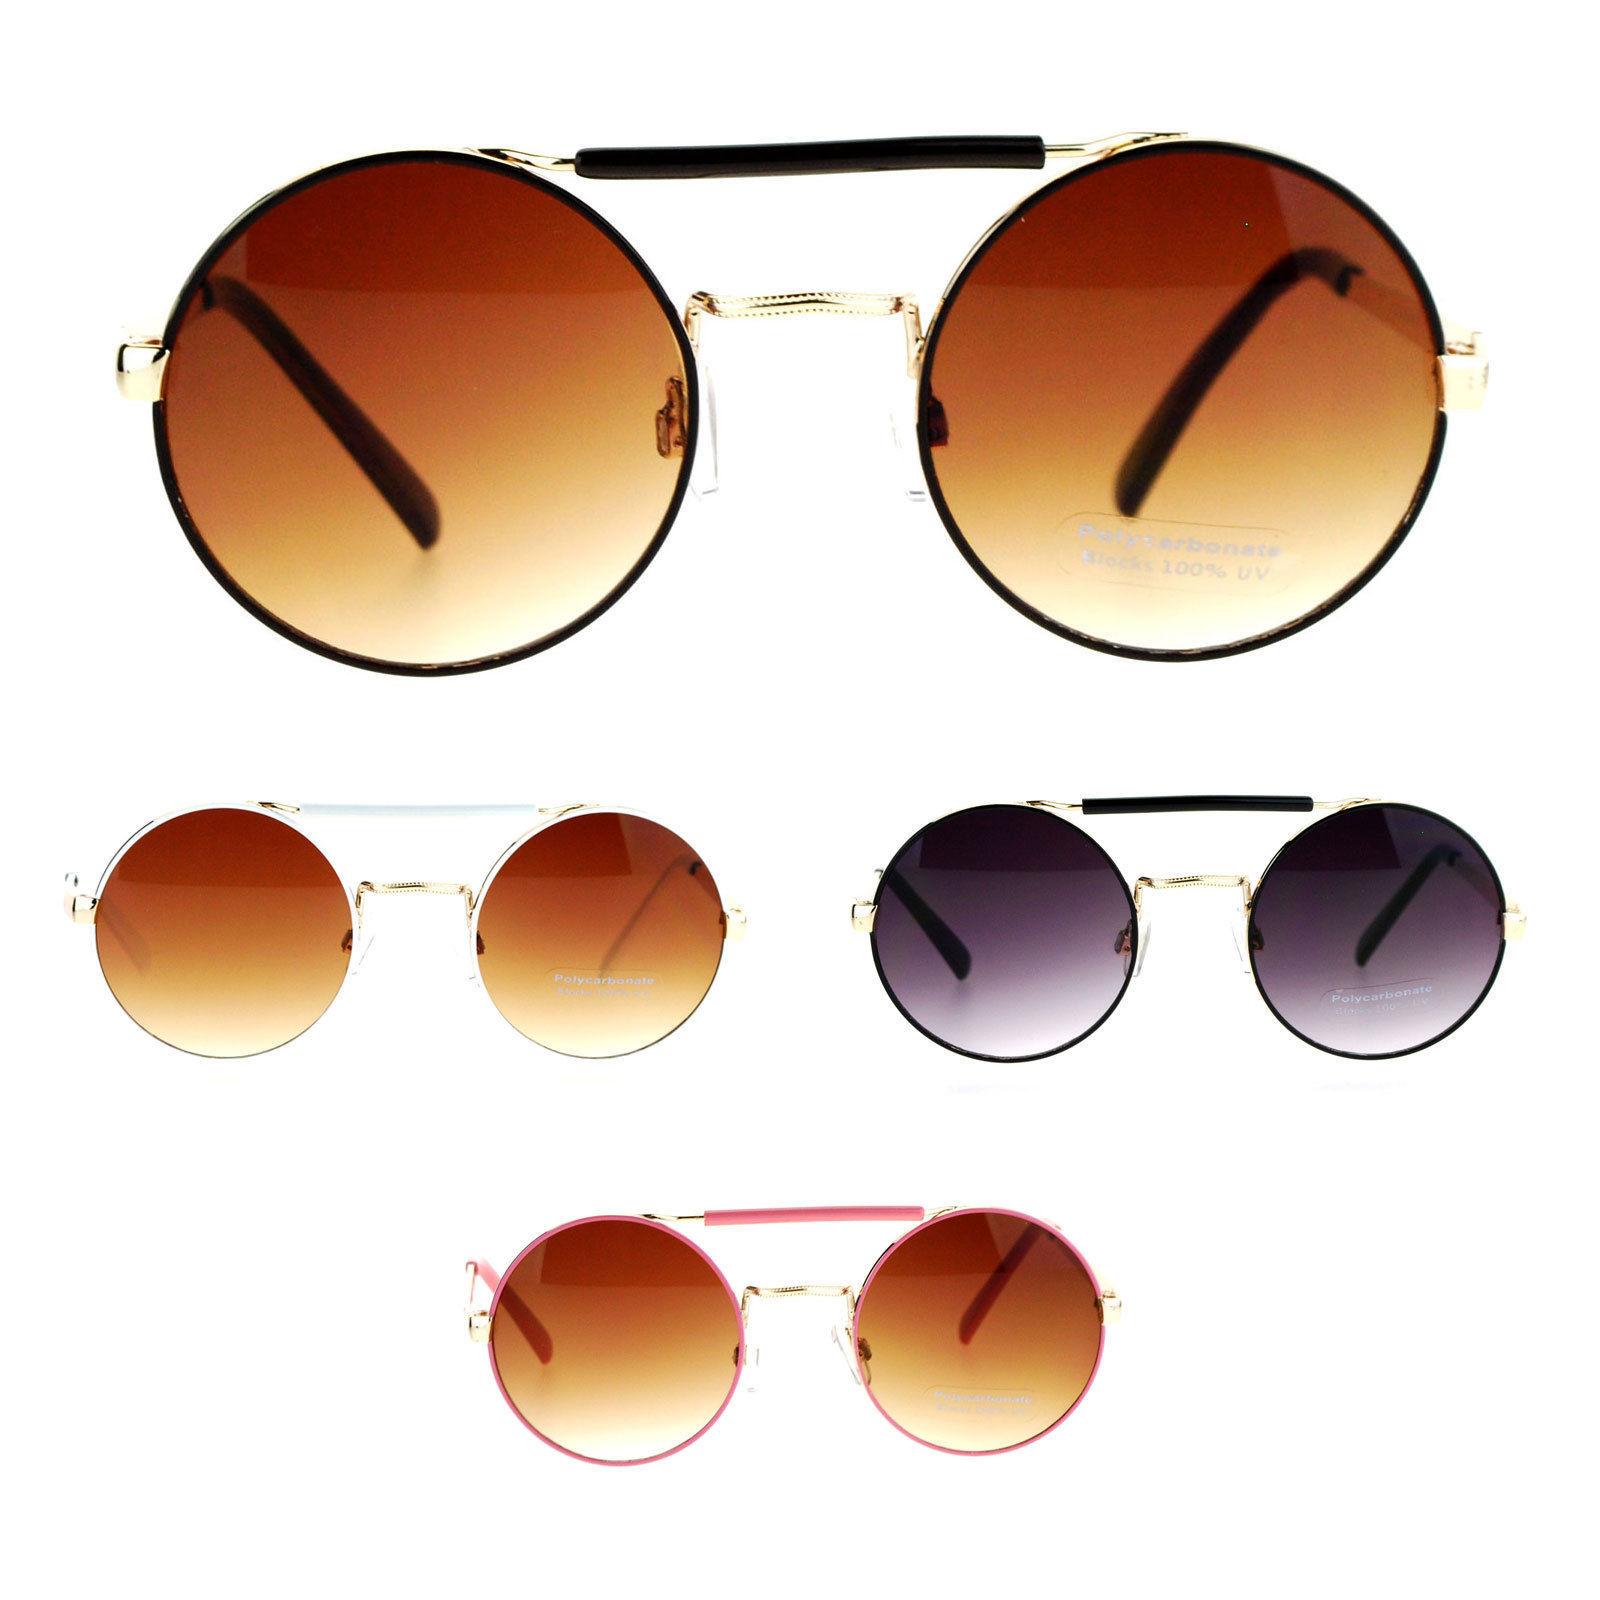 SA106 Womens Top Bridge Round Circle Lens Retro Hippie Sunglasses